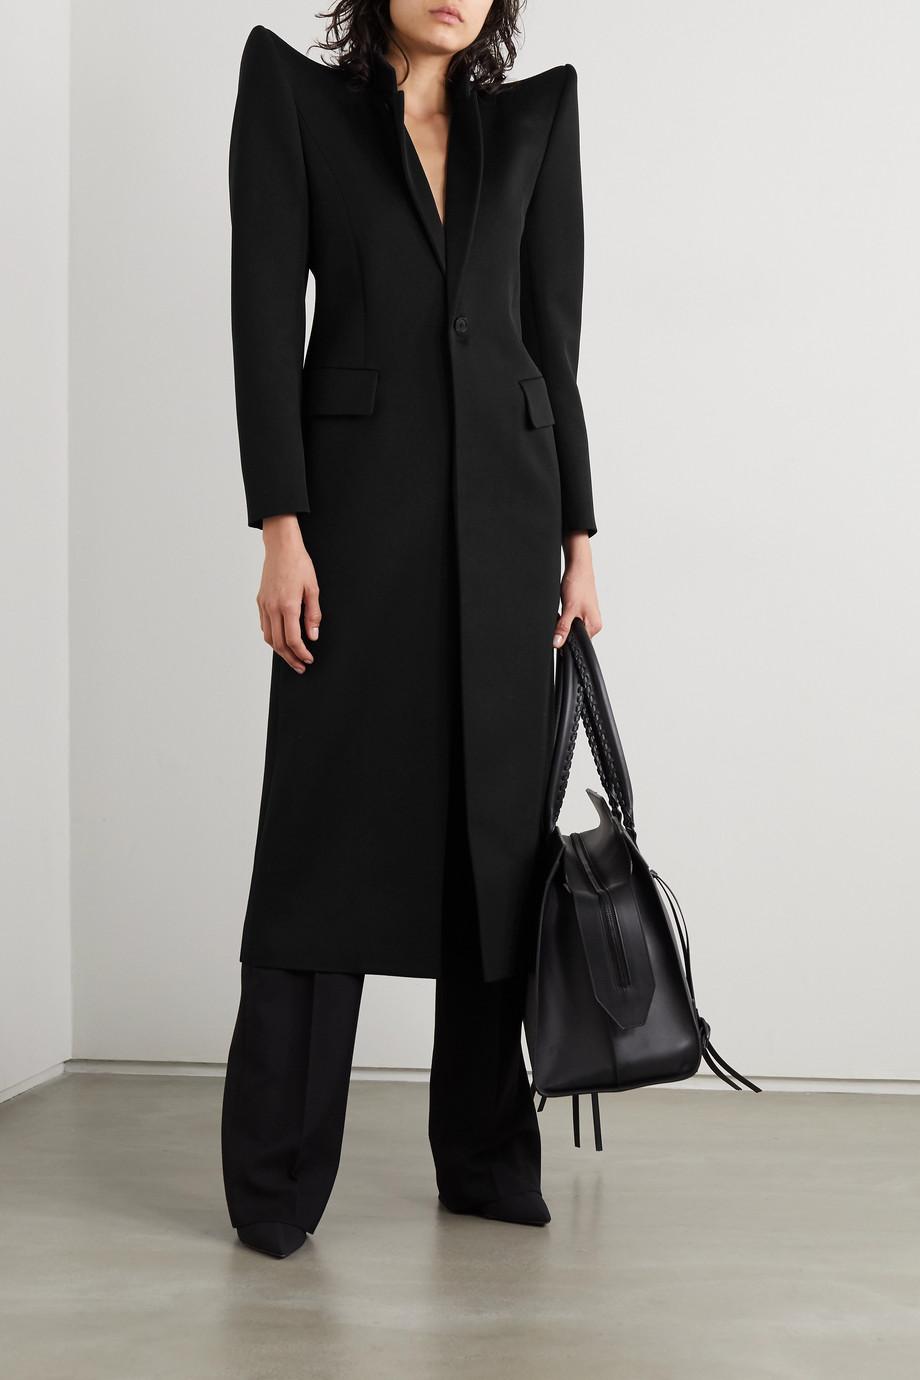 Balenciaga Manteau en serge de laine